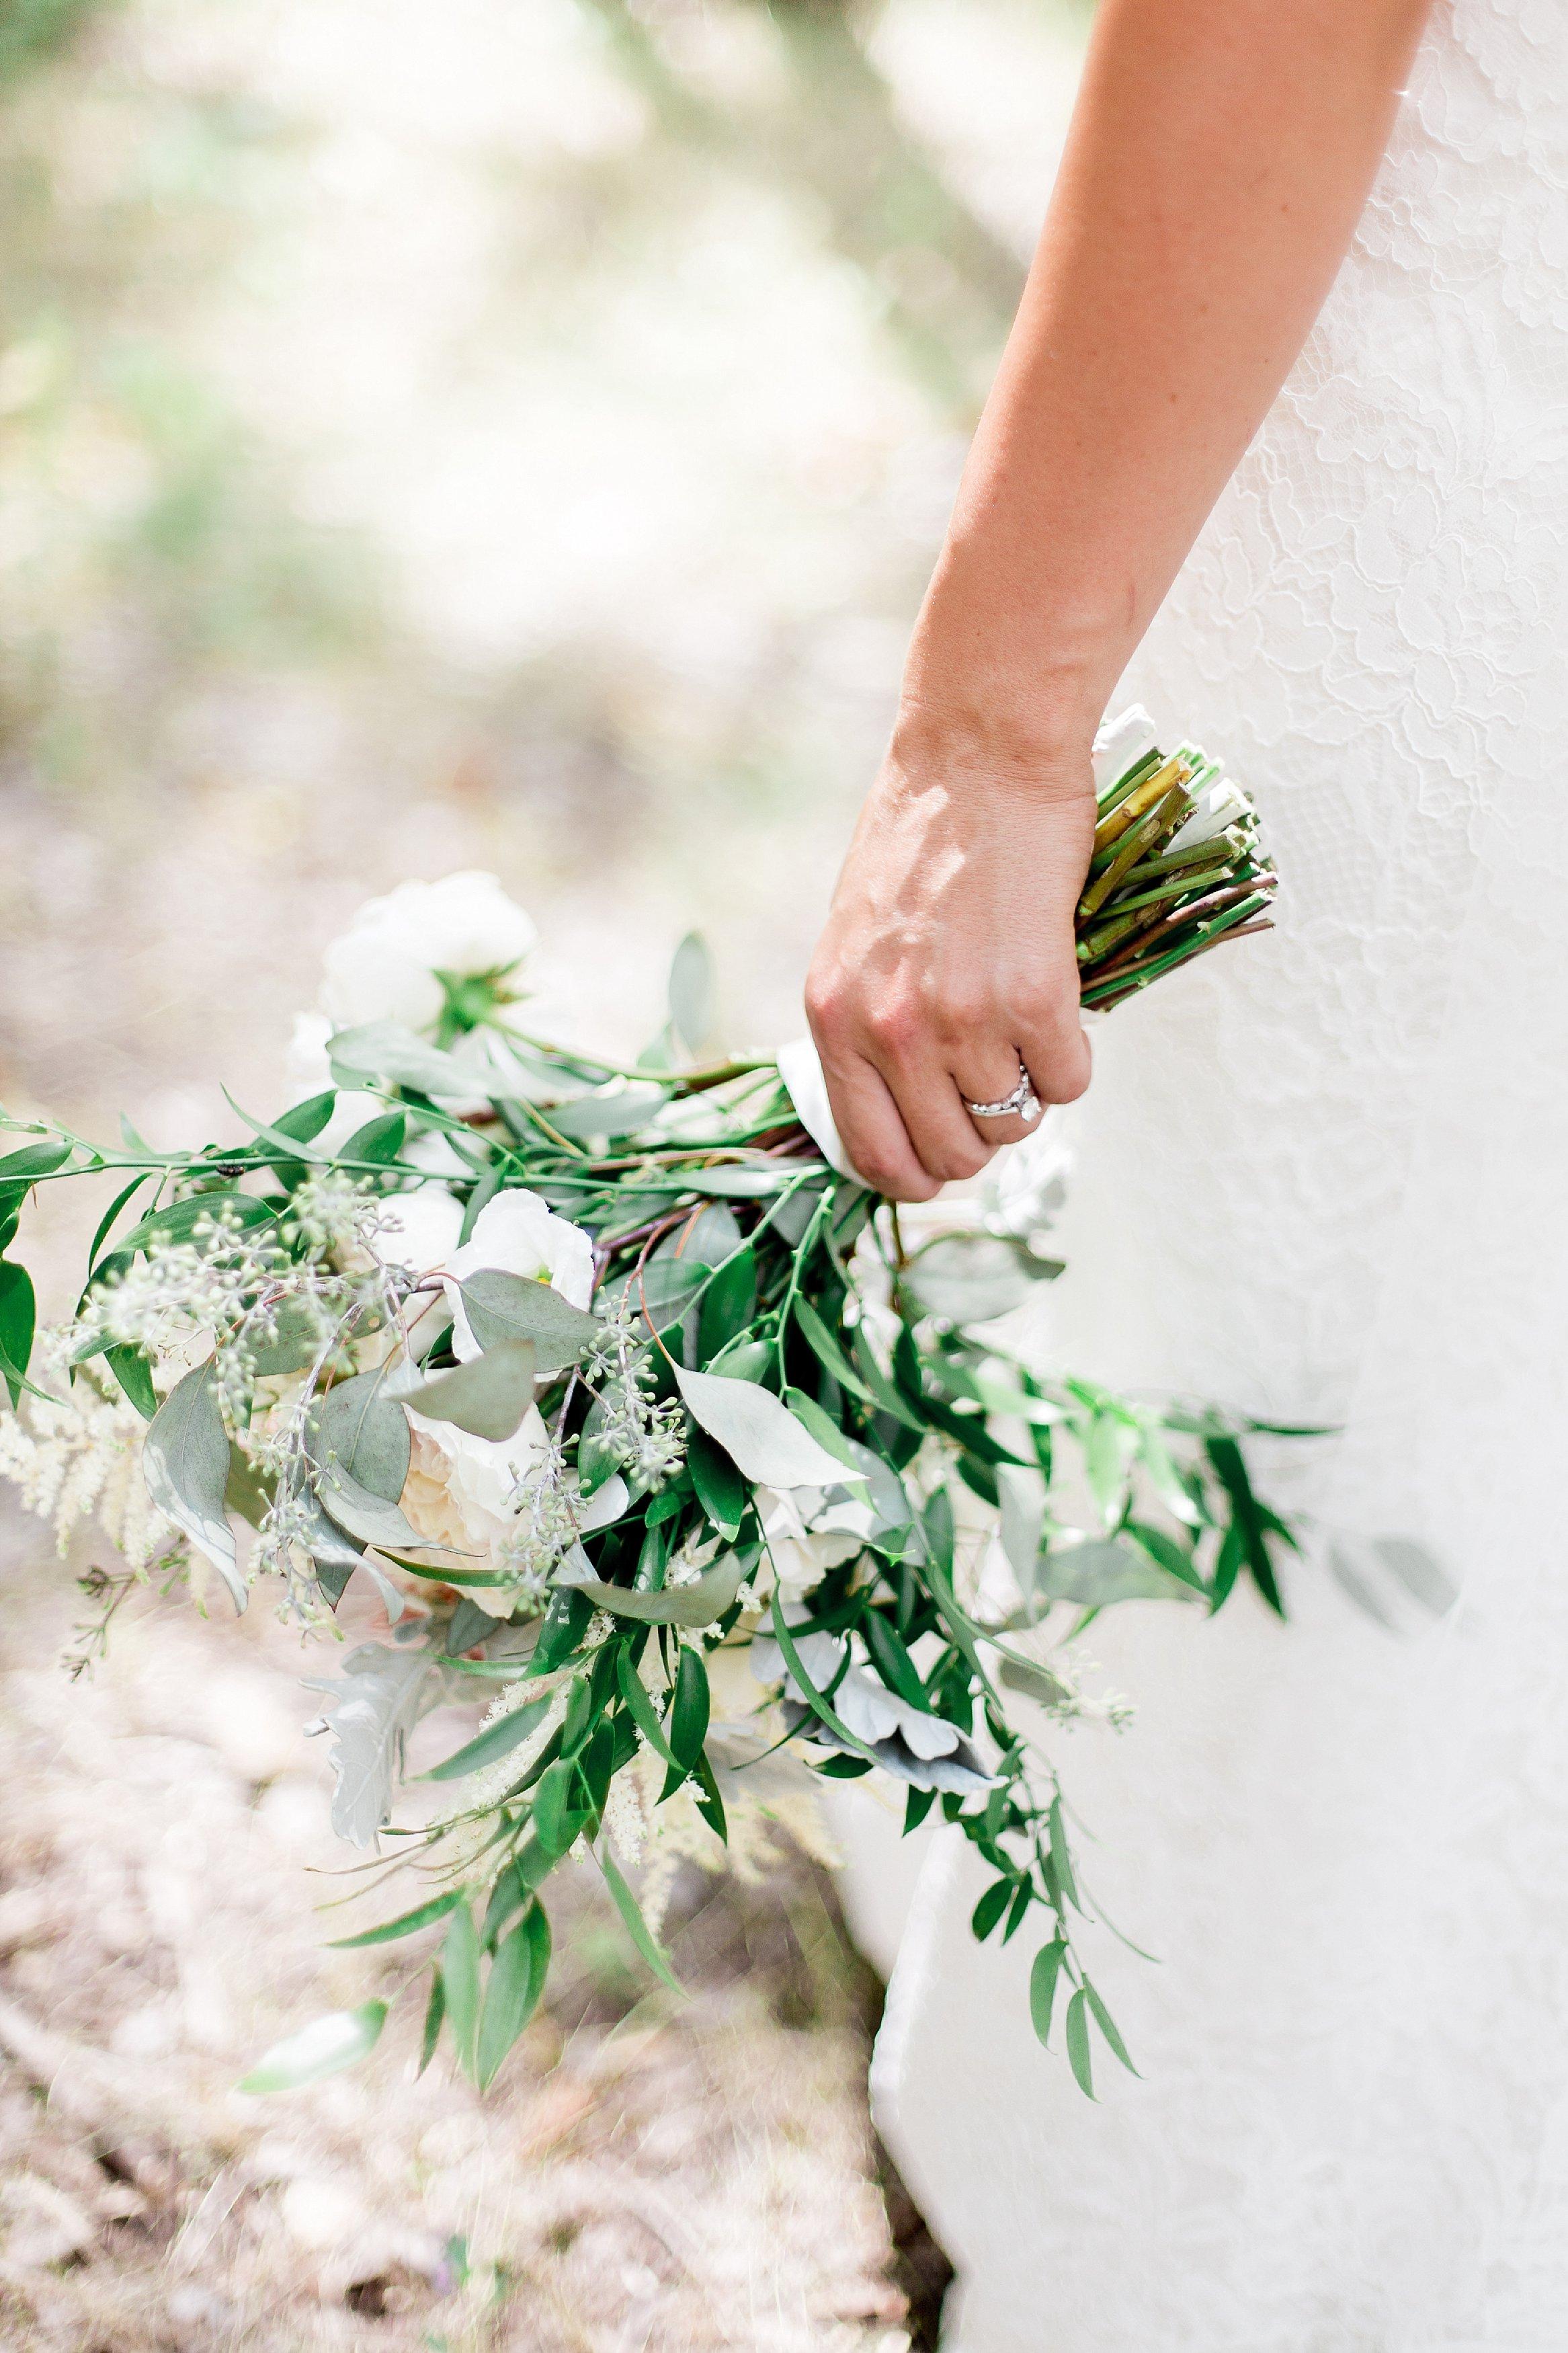 Vancouver Wedding Photographer film photographer Keila Marie Photography   Bridal bouquet   Garden inspired wedding